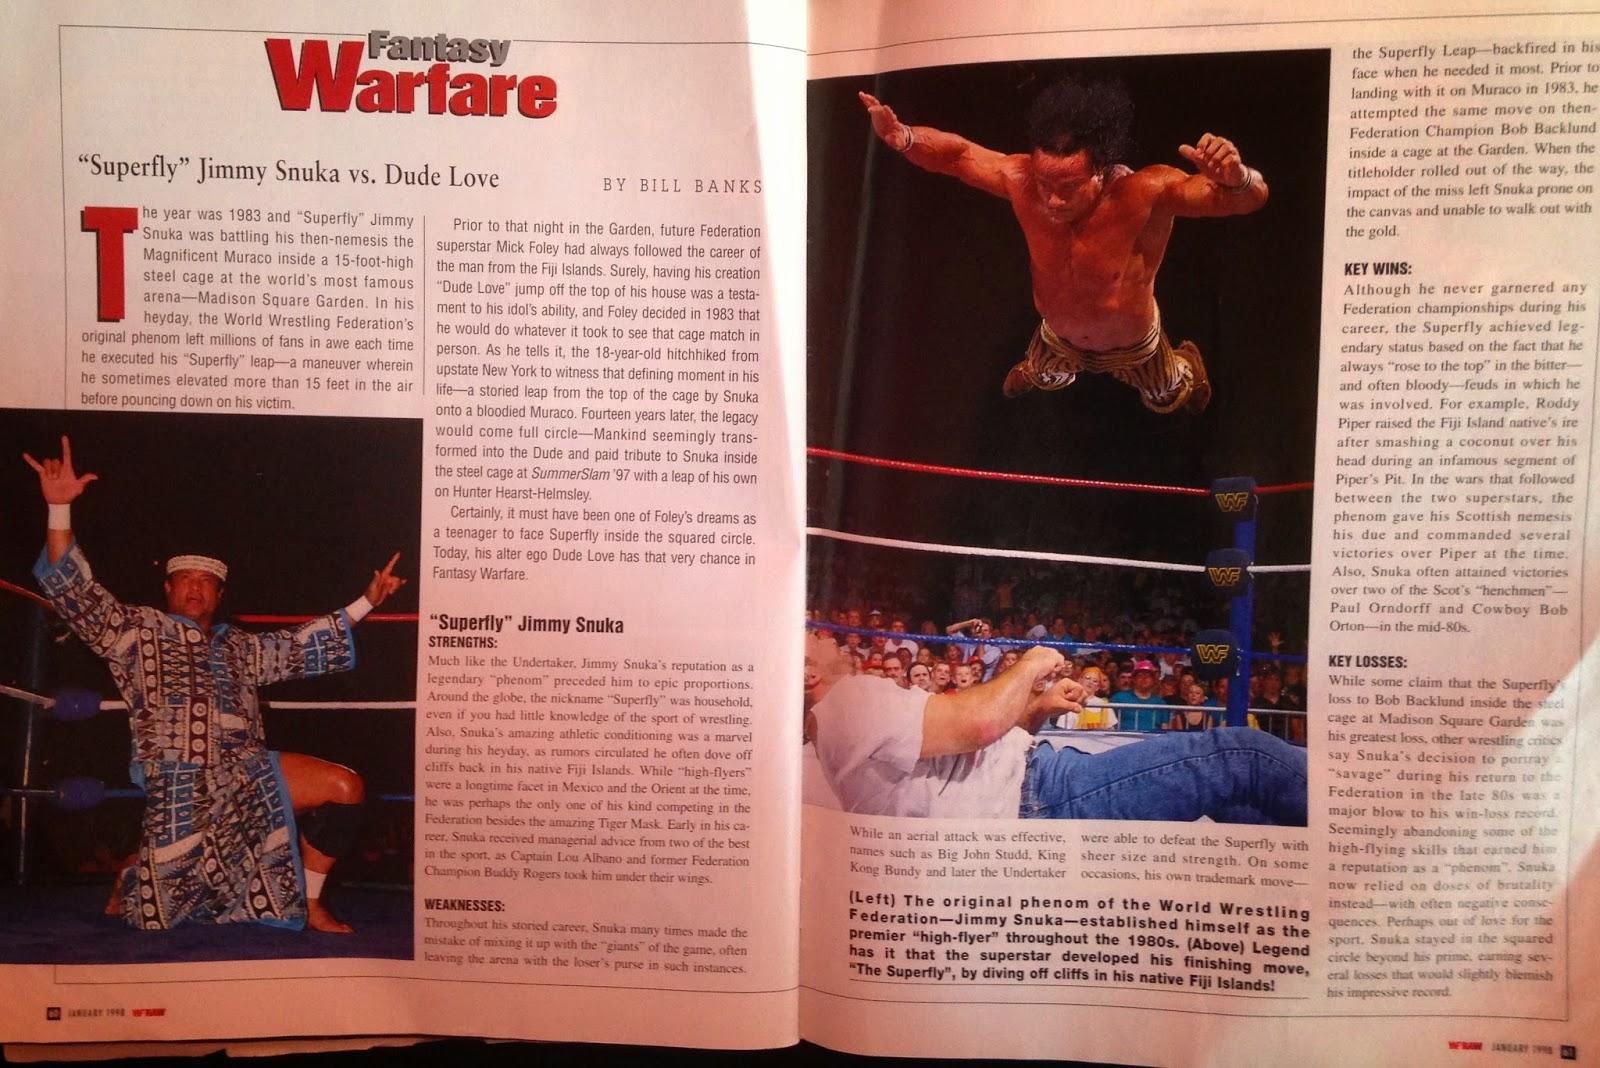 WWE: WWF RAW MAGAZINE - January 1998 - Dude Love vs. Jimmy Snuka fantasy warfare